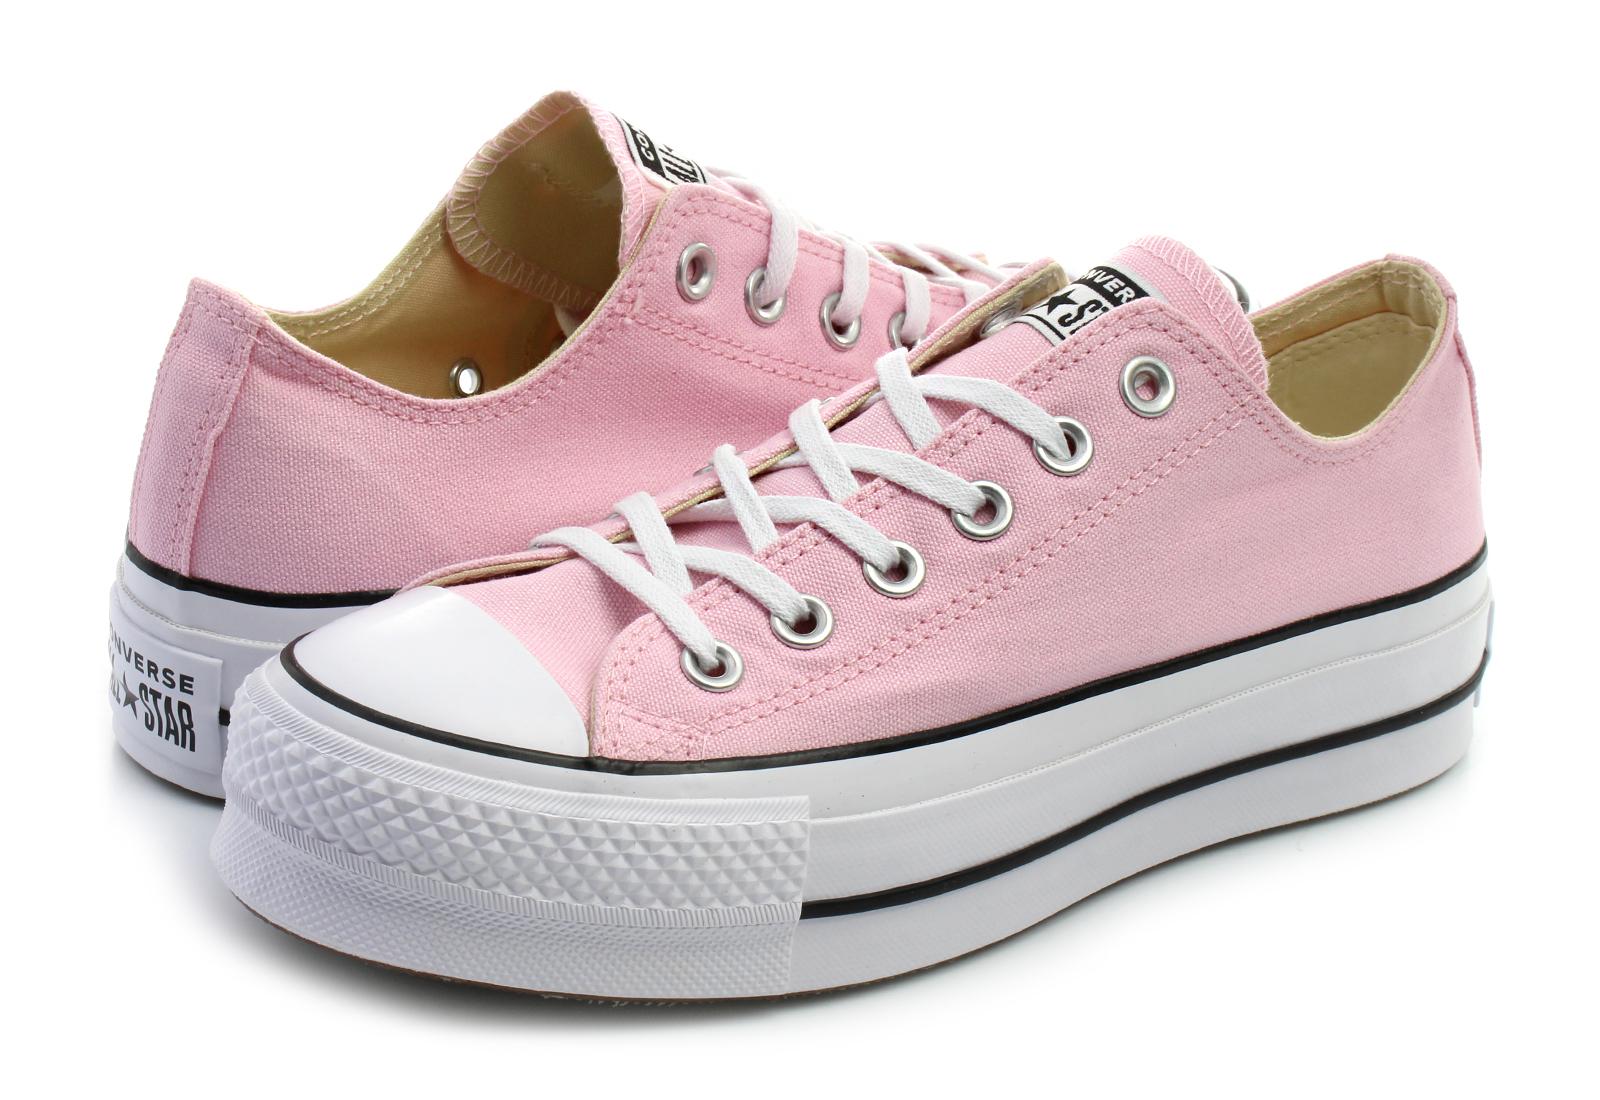 Converse Office Shoes Romania